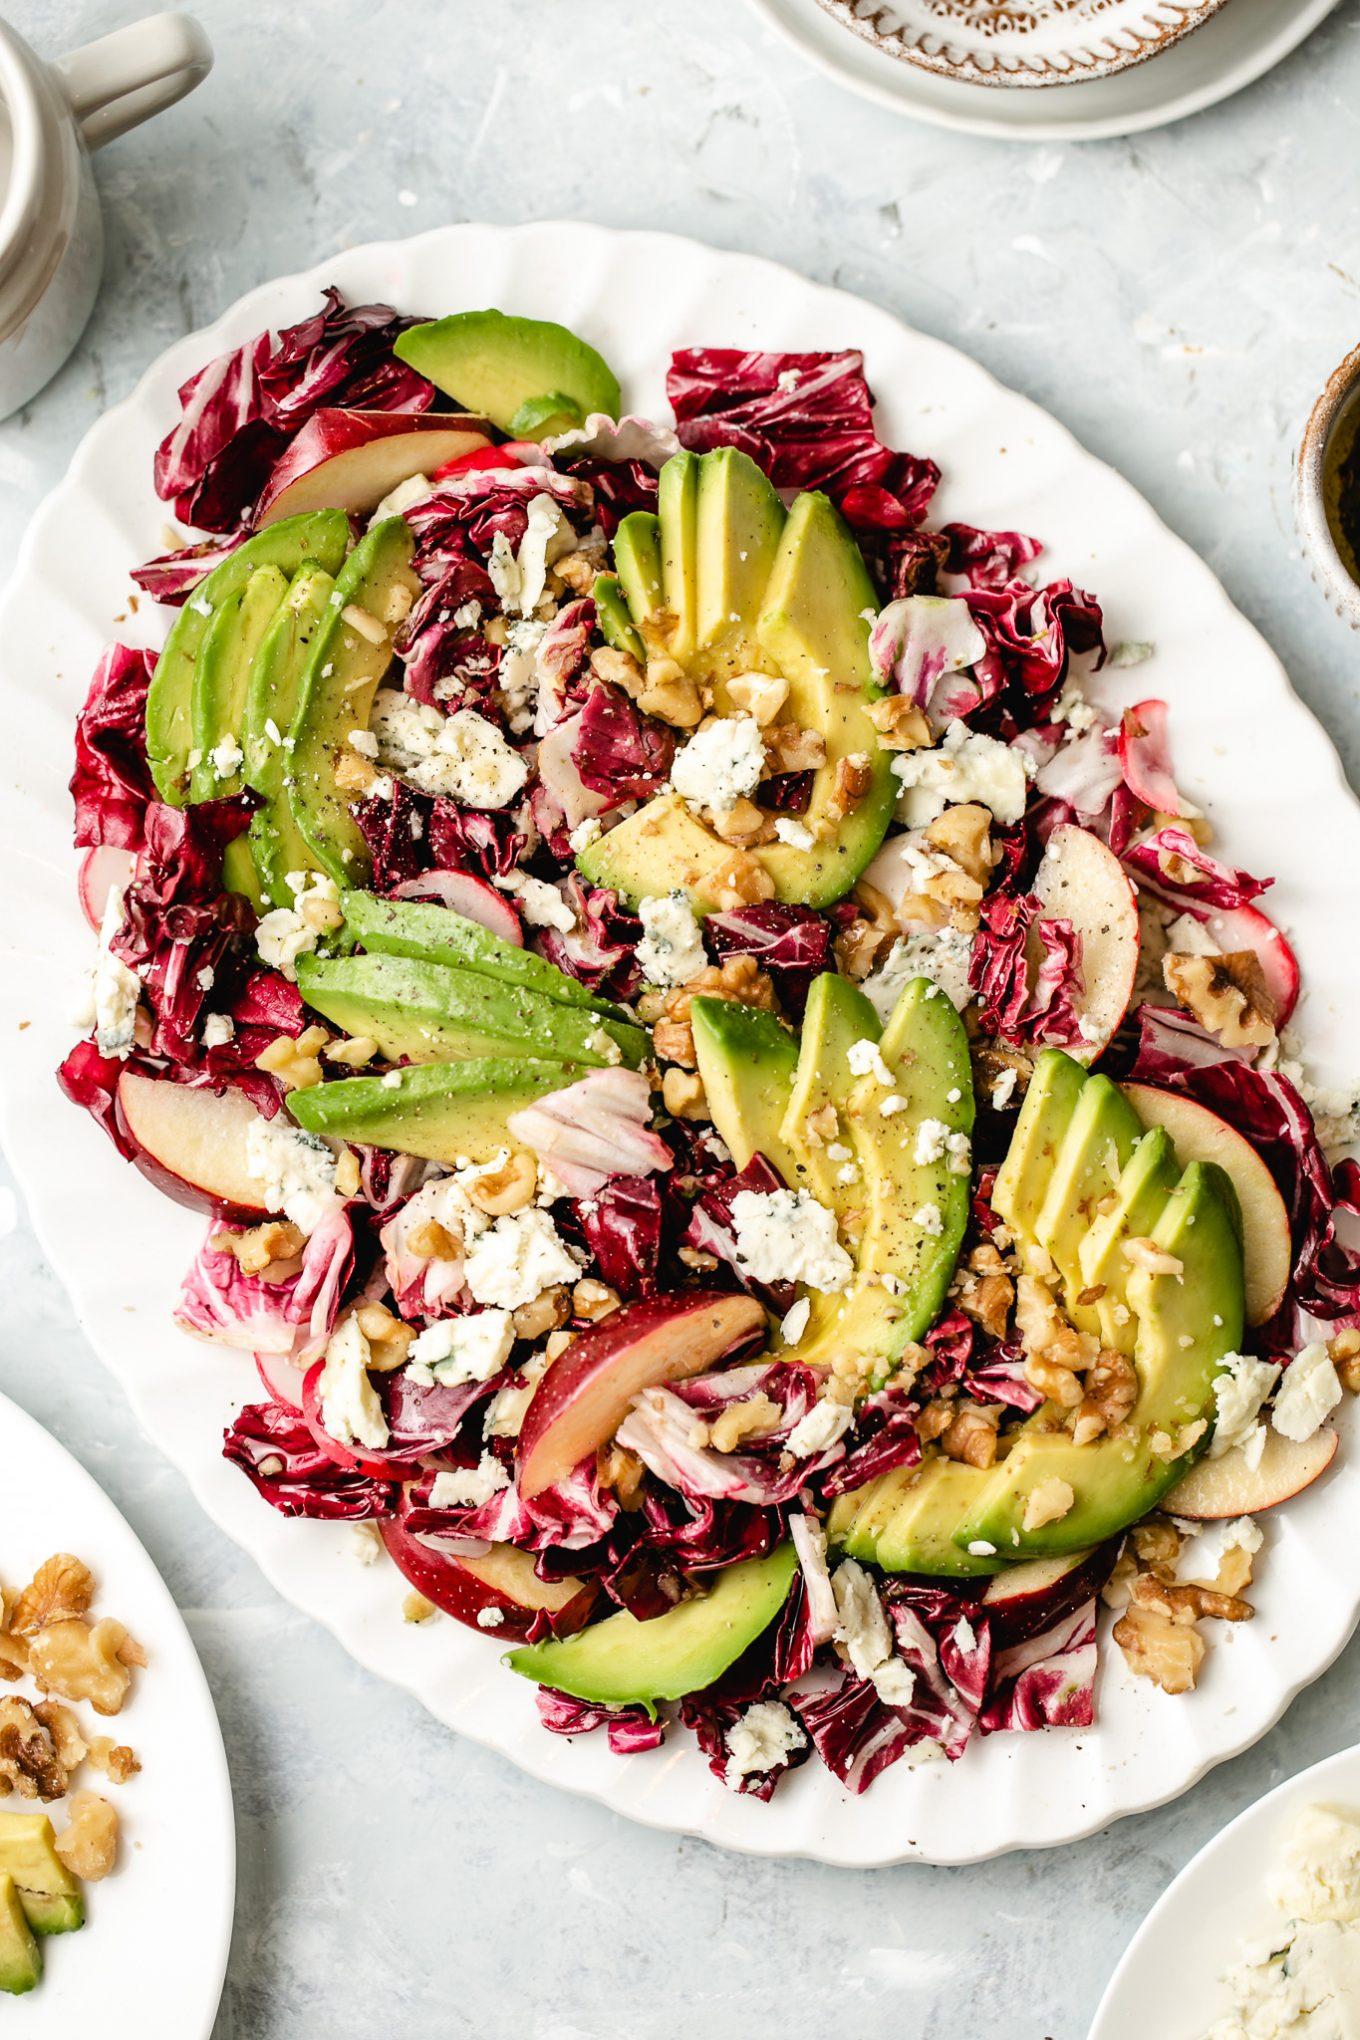 Radicchio Salad with Apple, Blue Cheese and Avocado